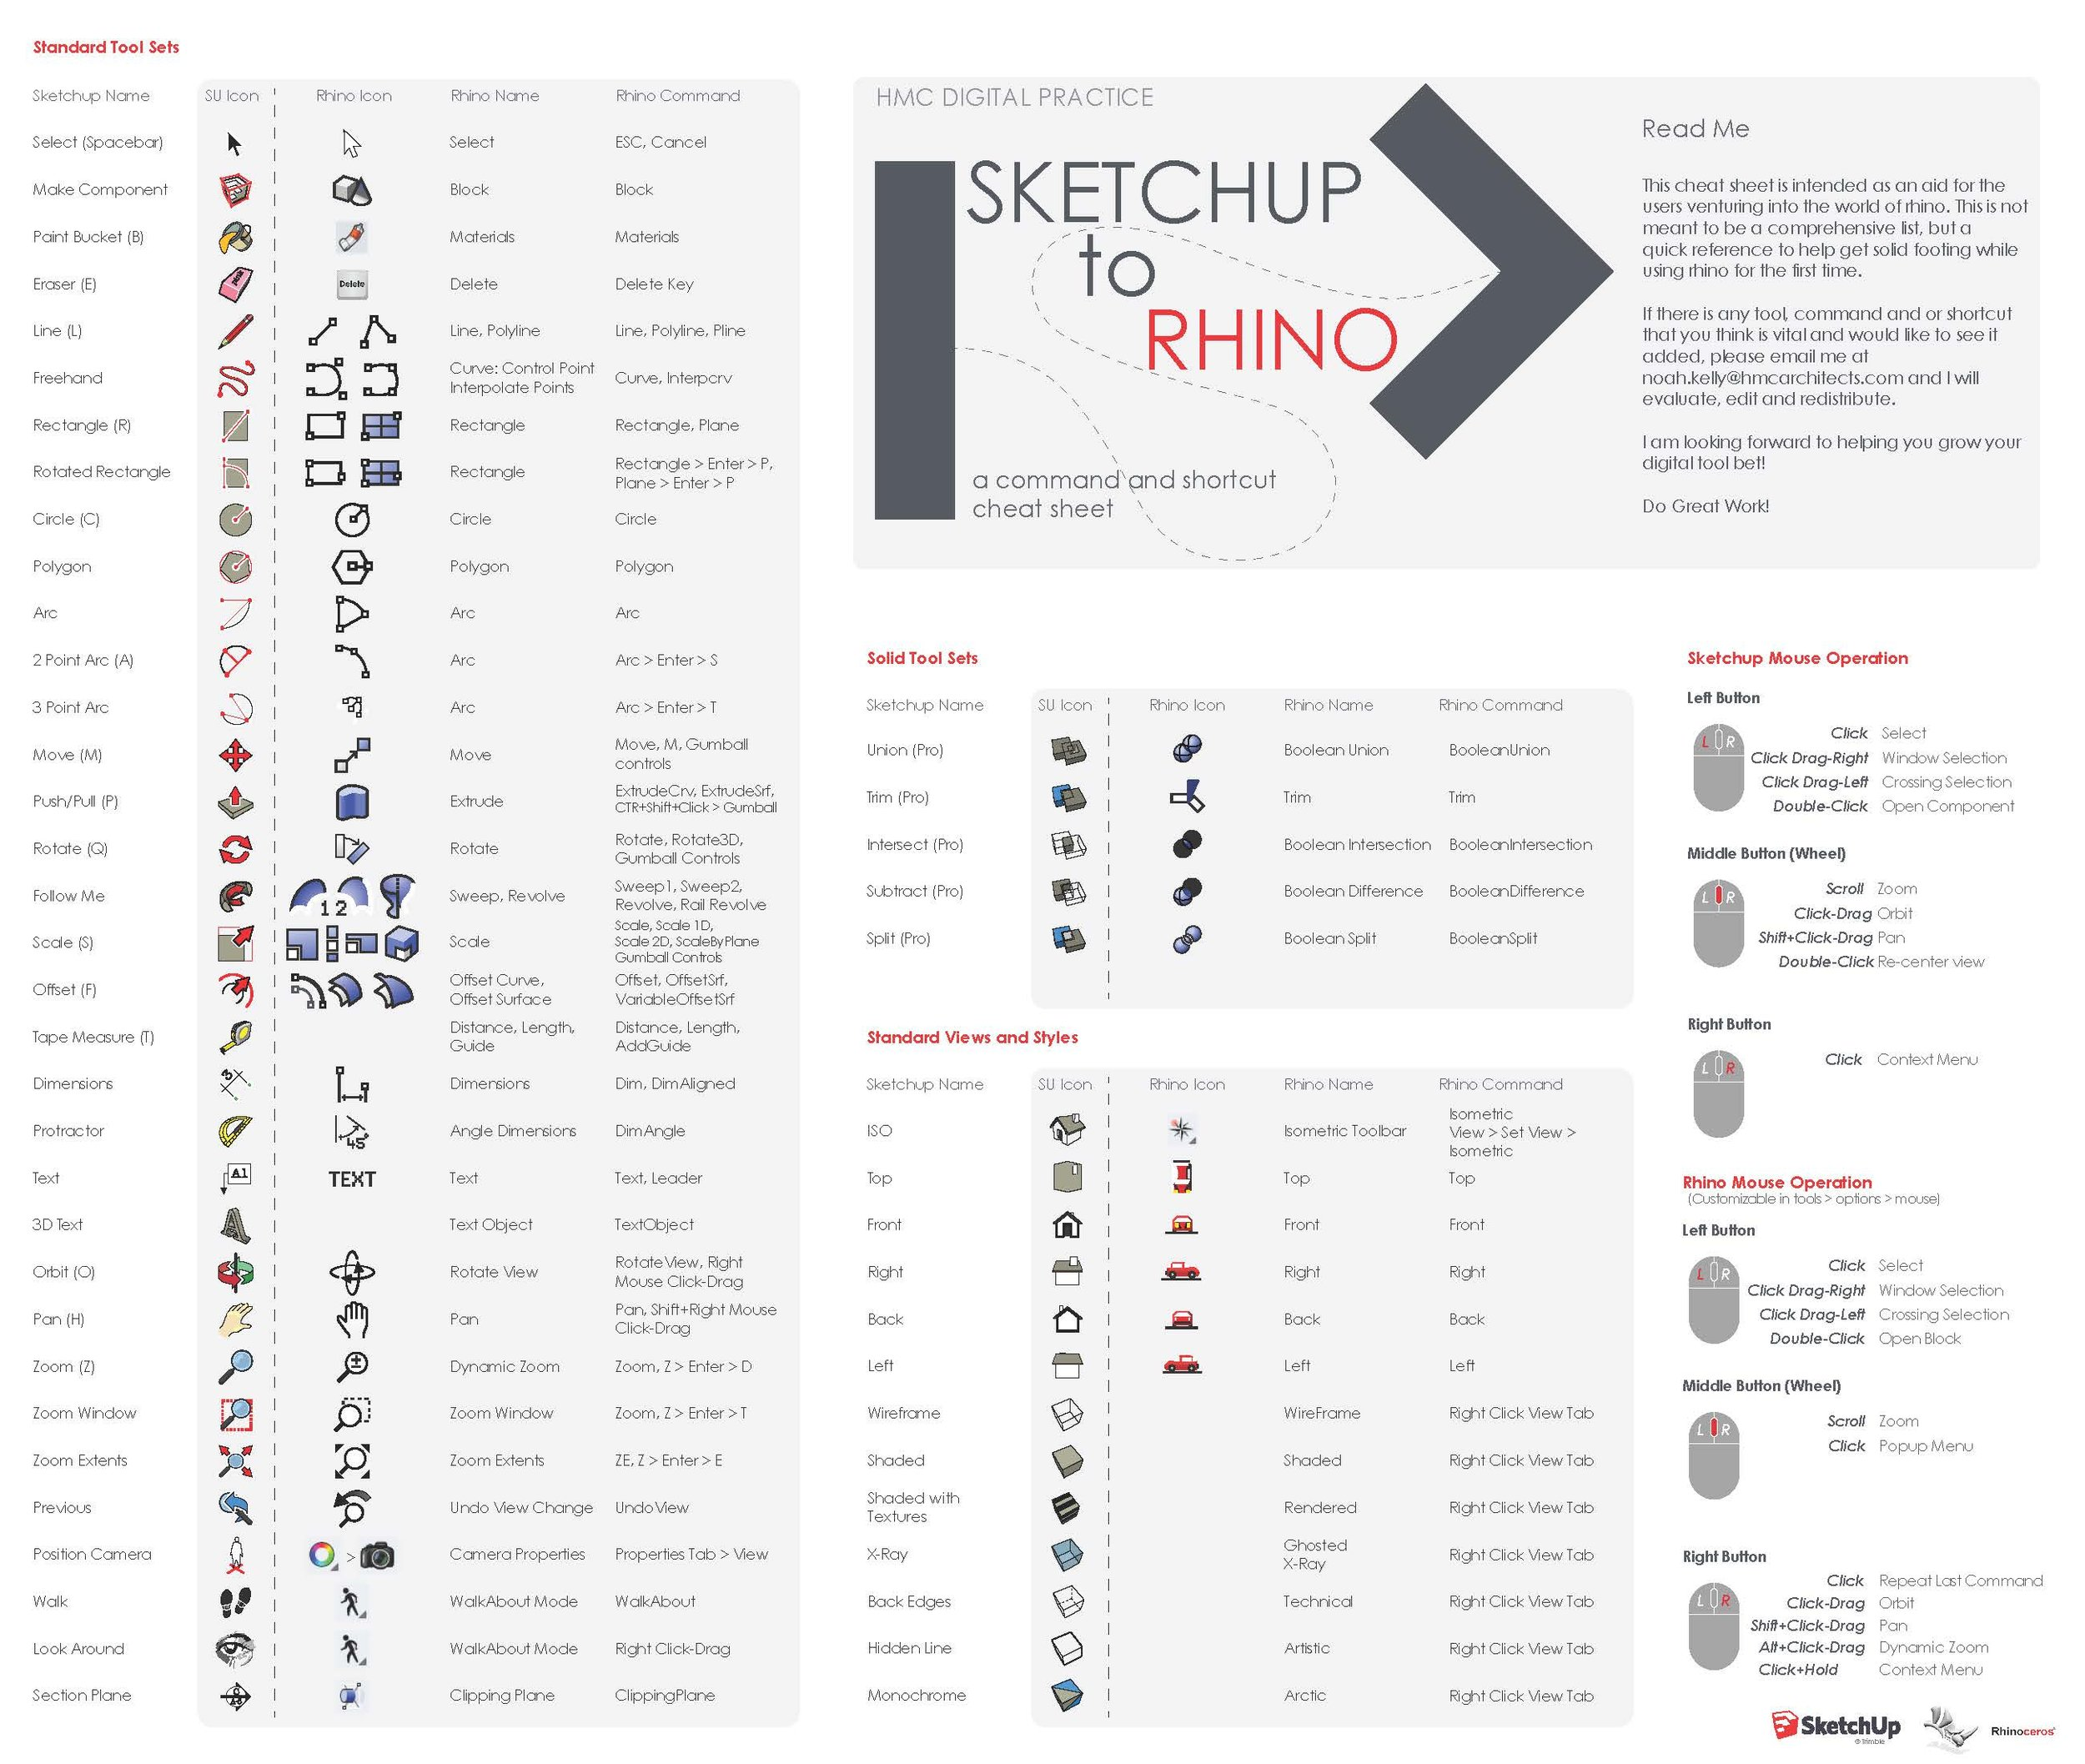 Sketchup Rhino Cheat Sheet full.jpg